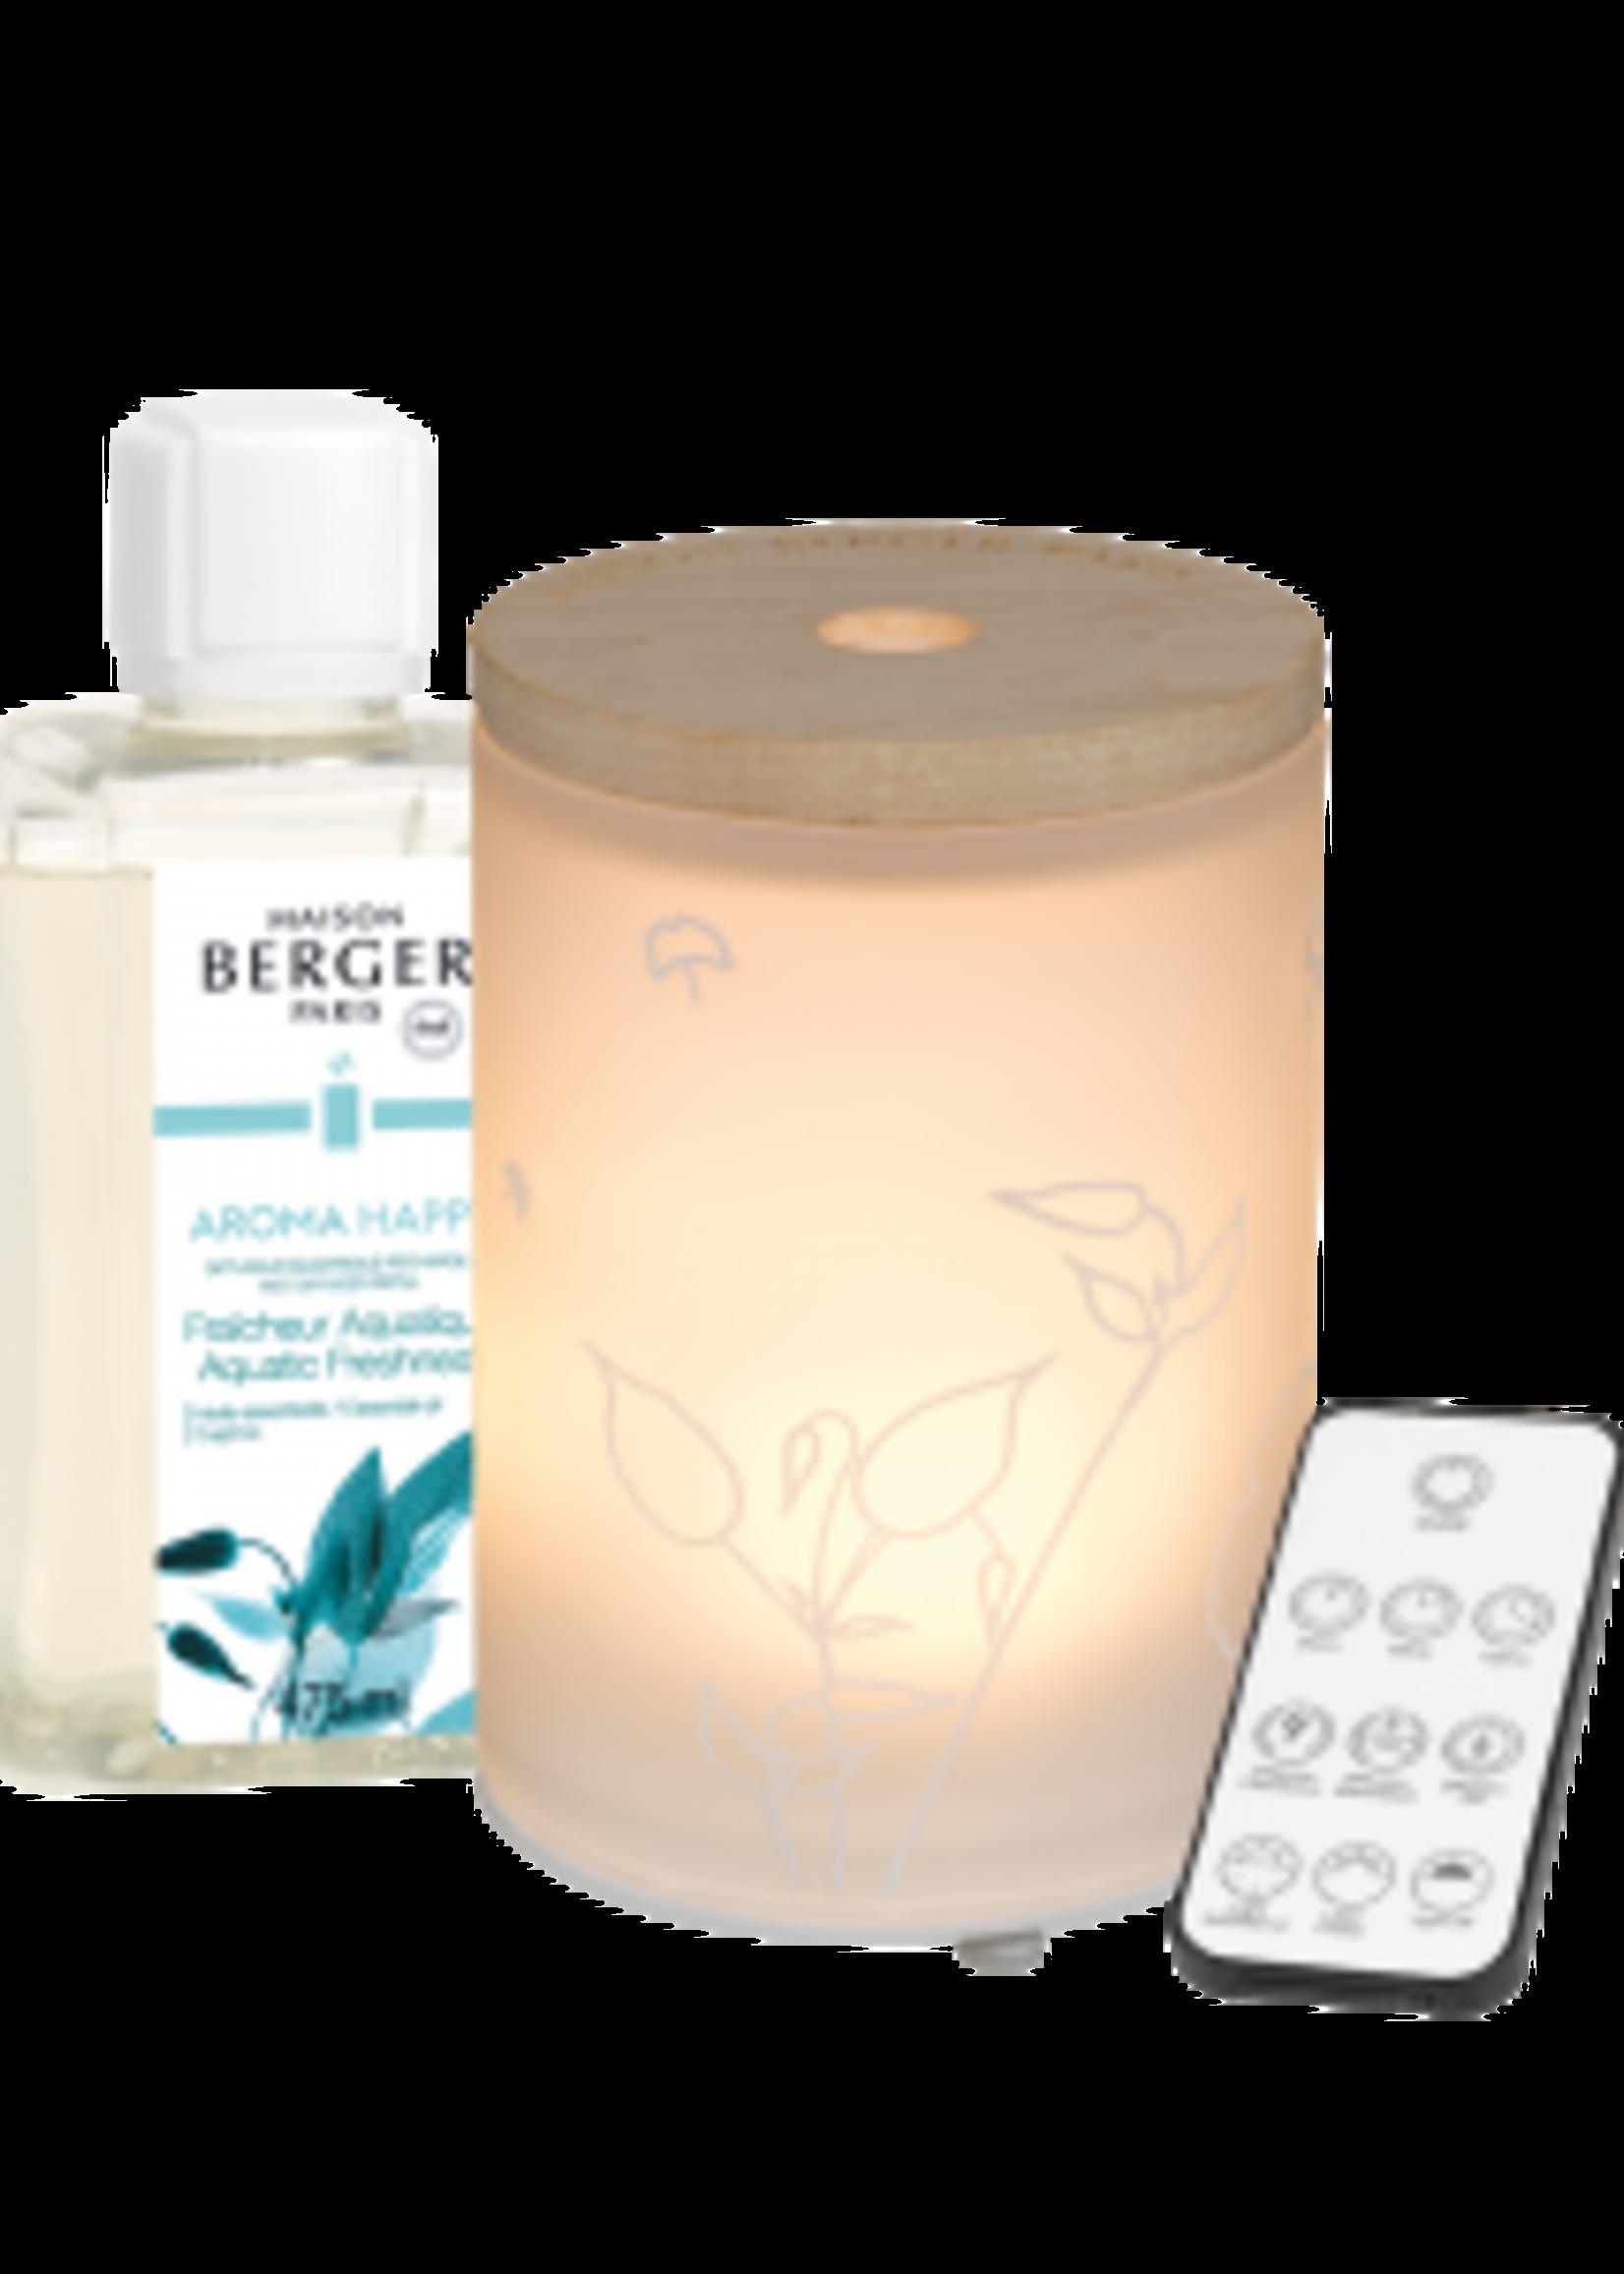 Lampe Berger Mist Diffuser Aroma Happy